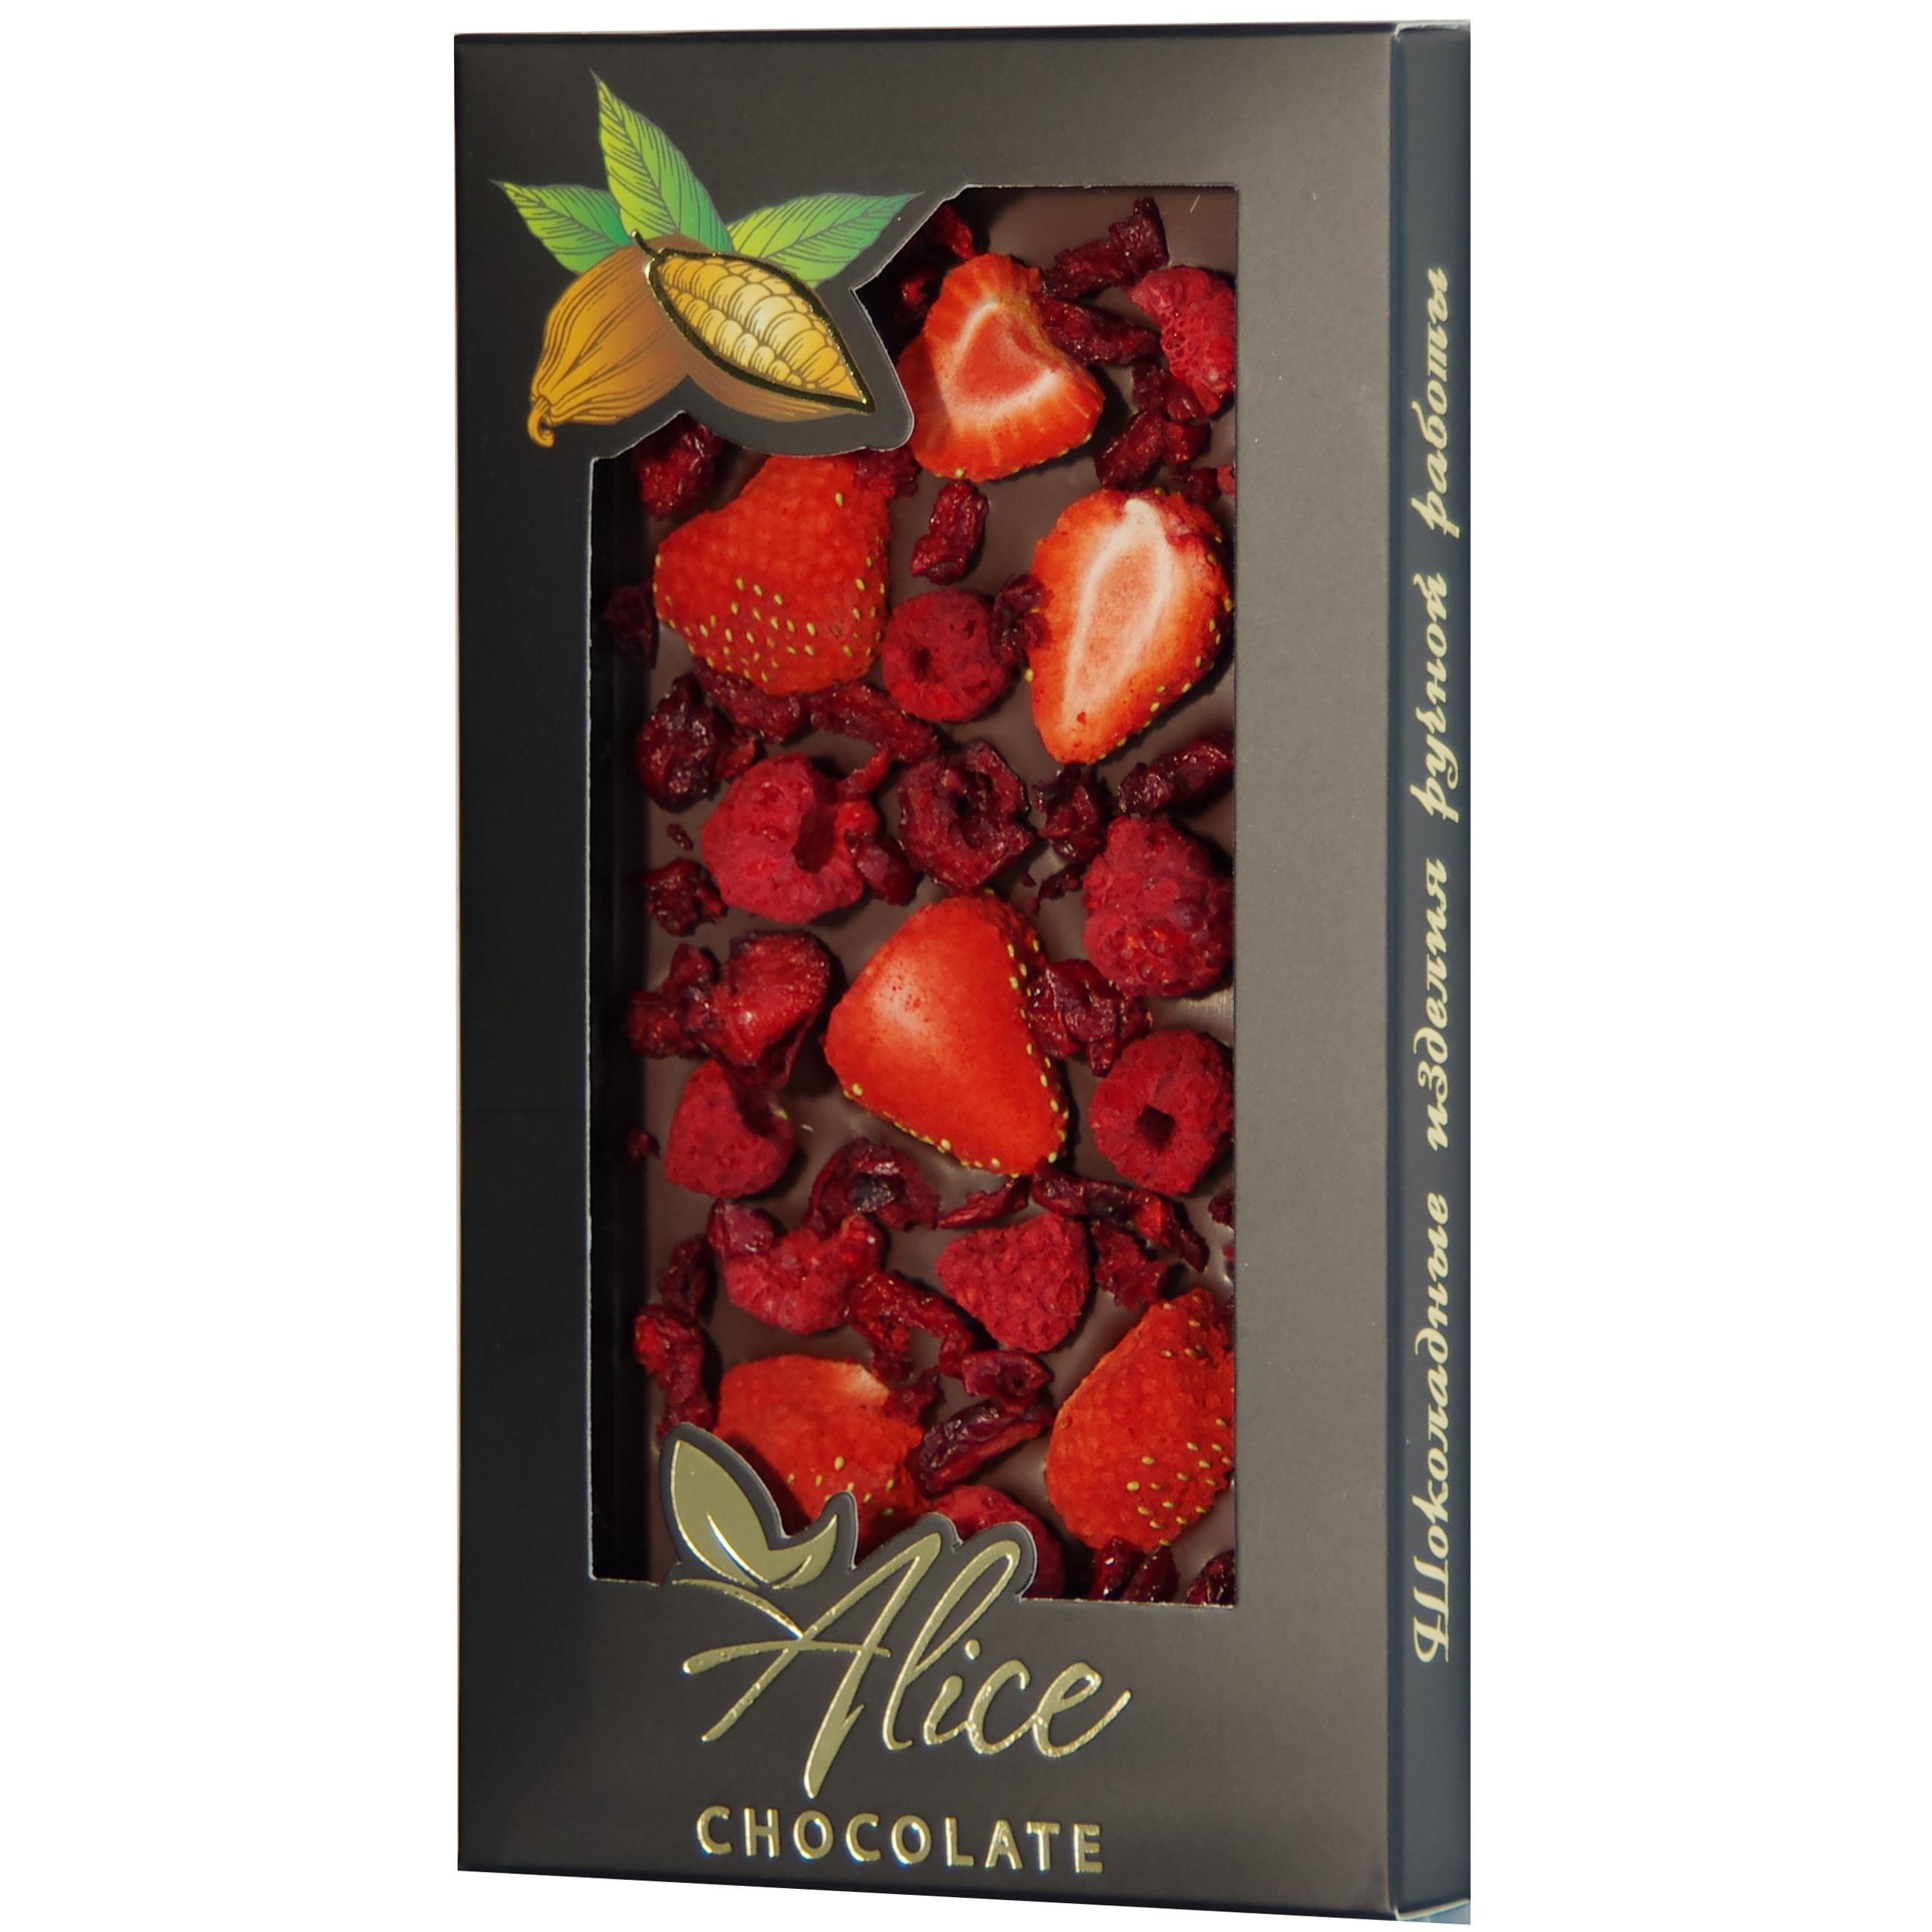 http://alice-chocolate.ru/wp-content/uploads/2018/05/Temnyj-s-klubnikoj-malinoj-i-vishnej.jpg